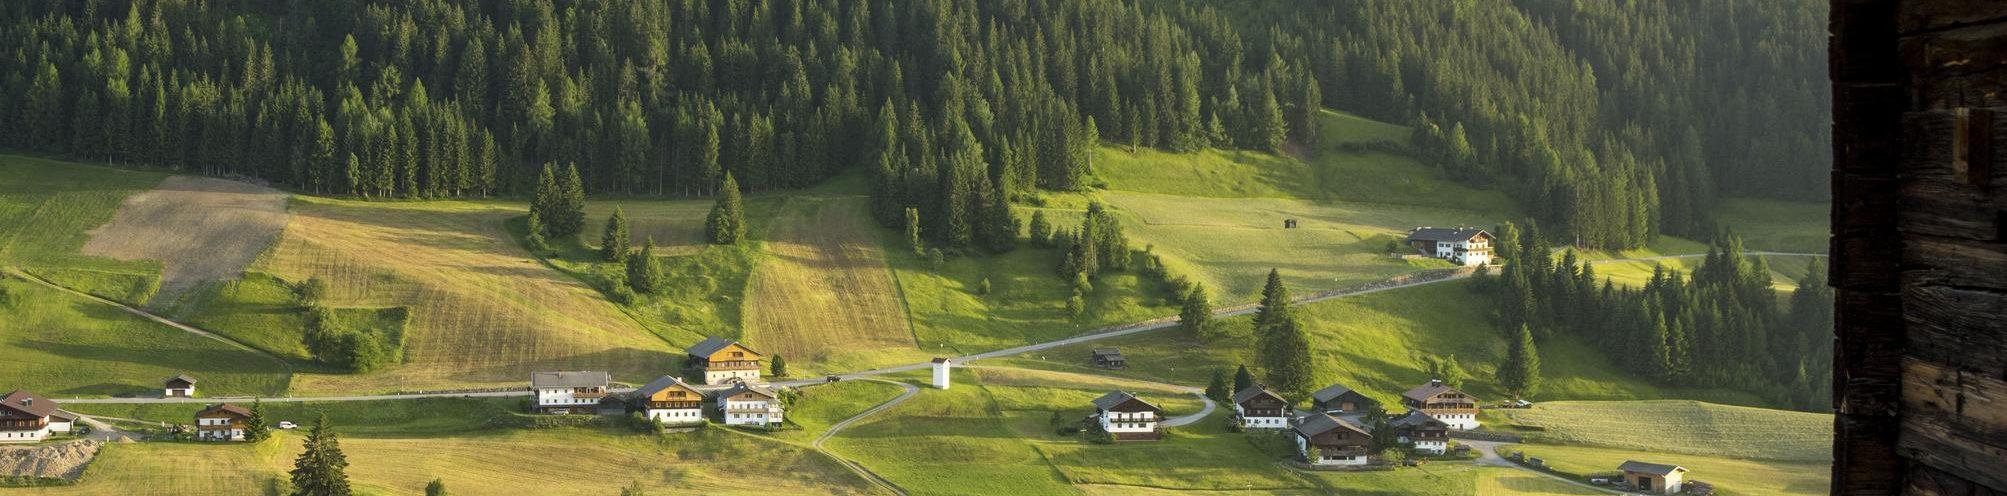 Höfe-Trail